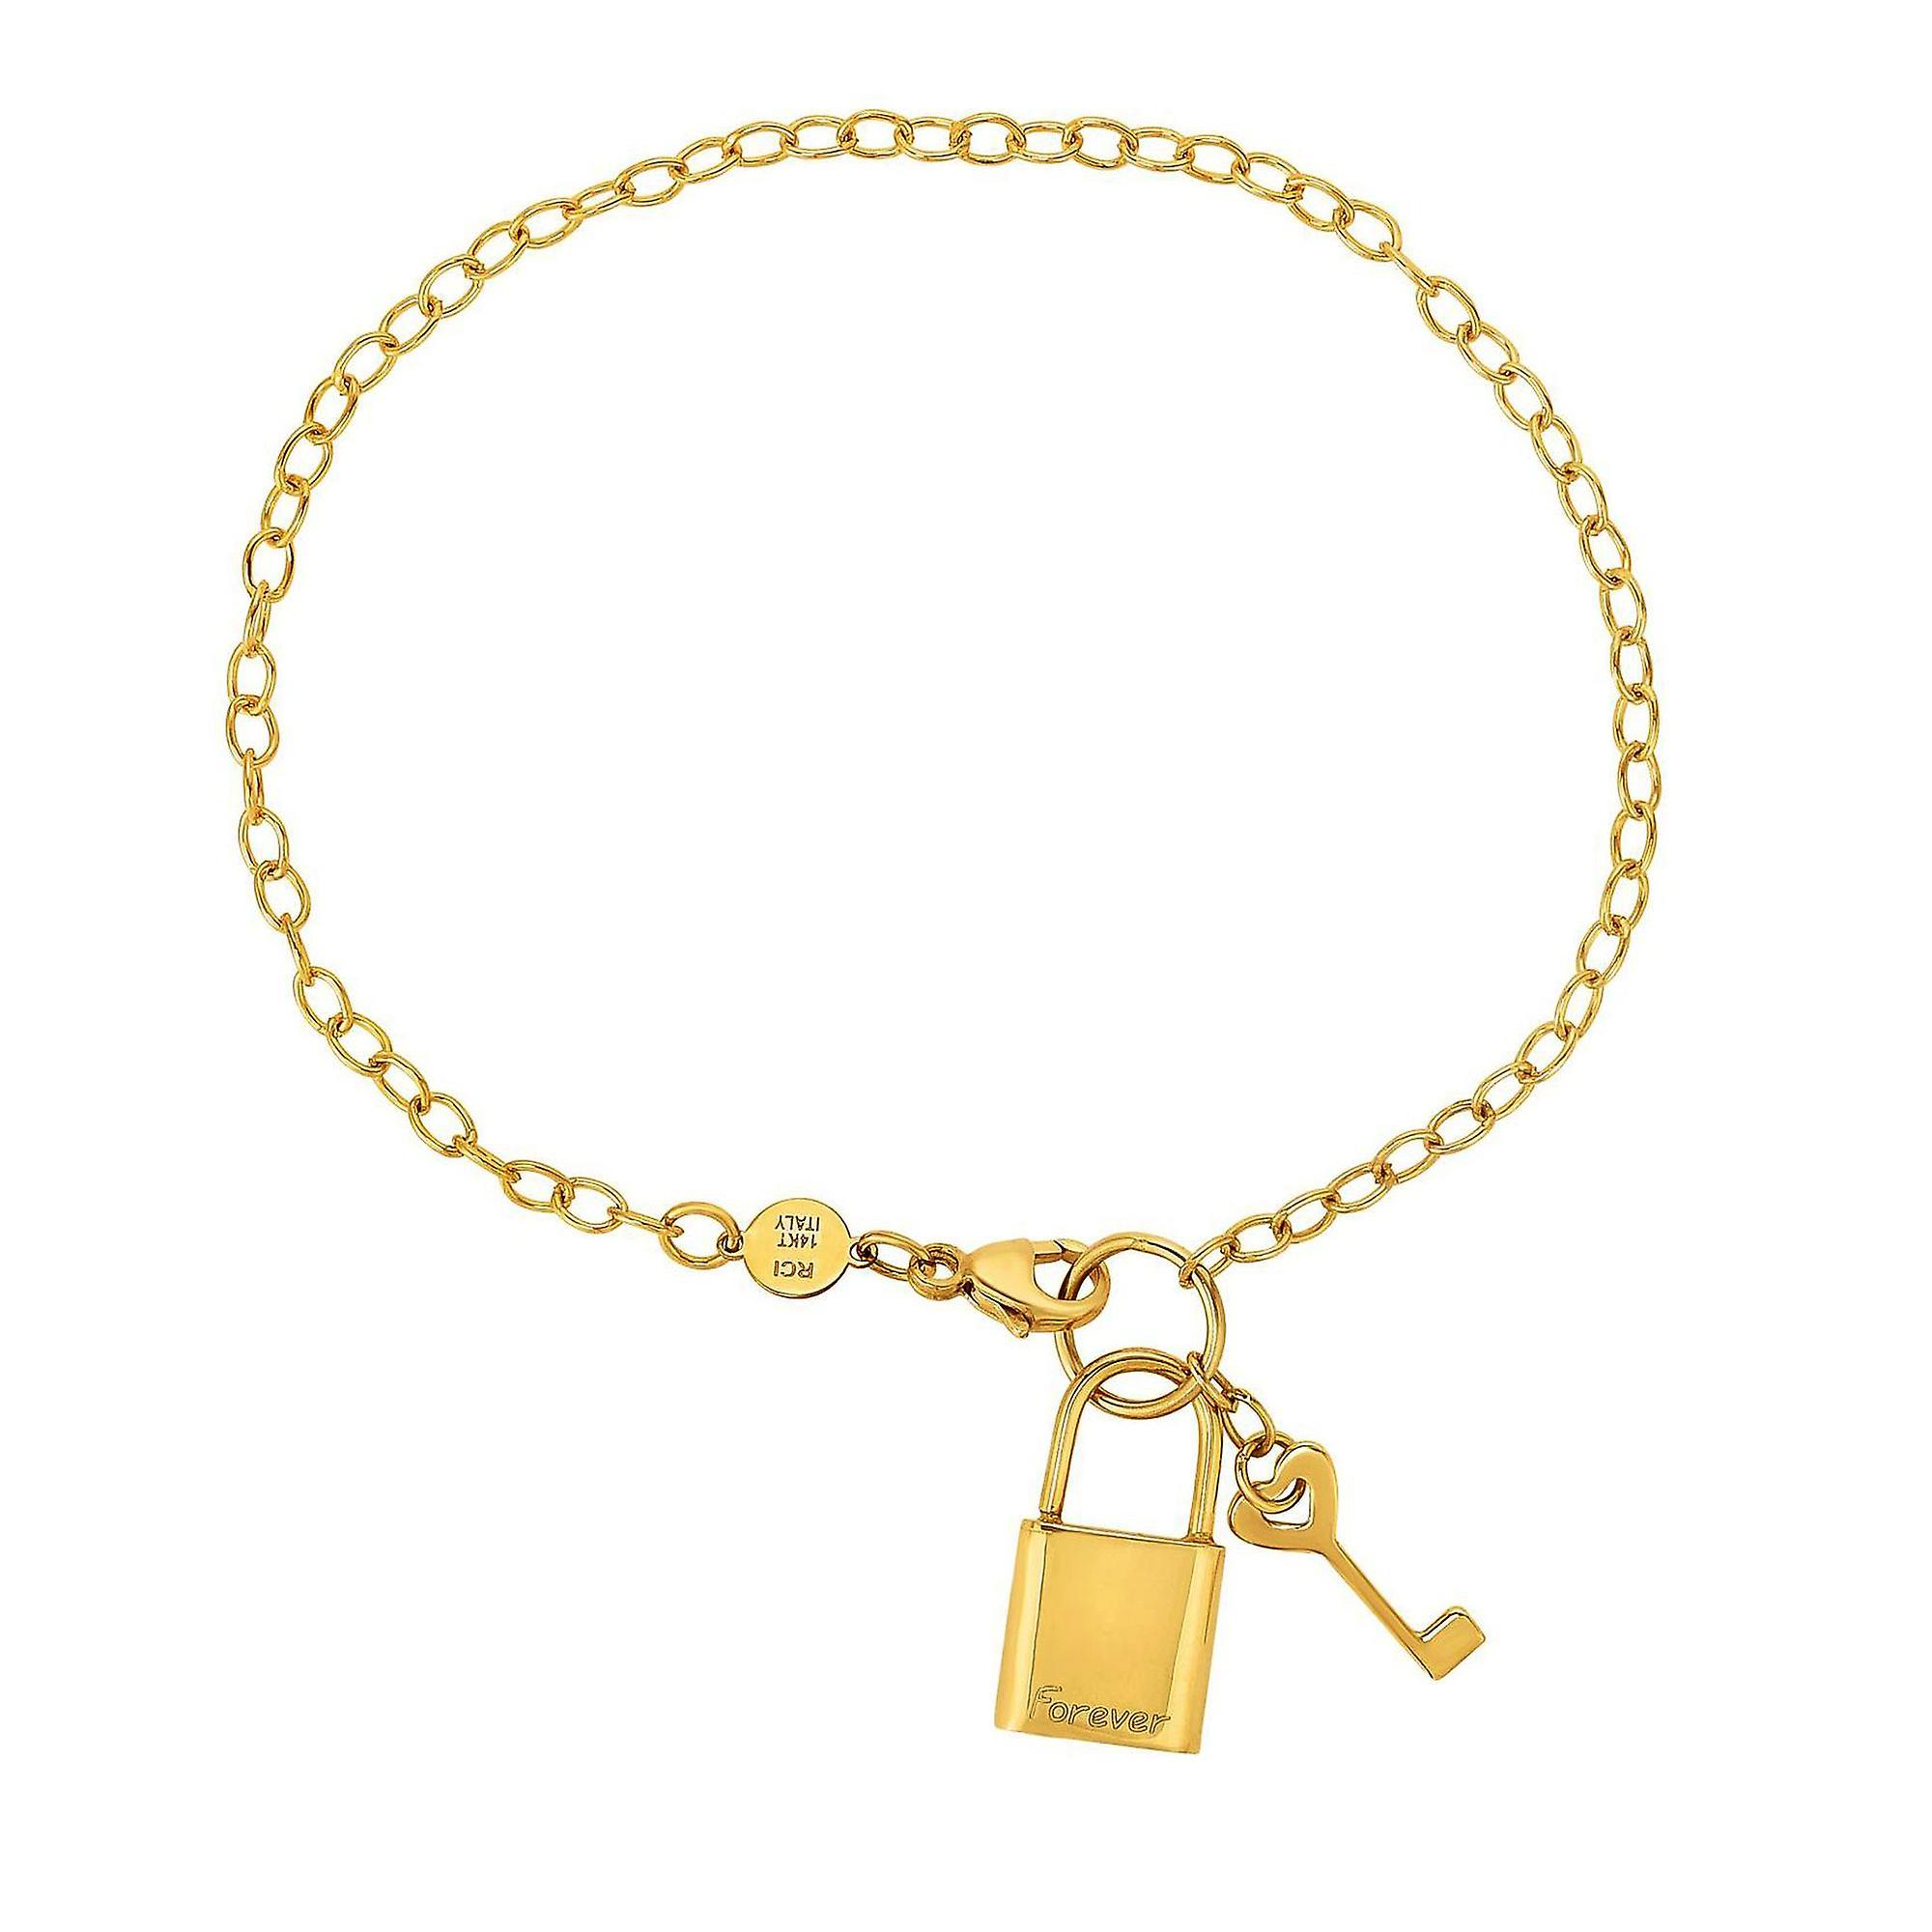 14k Yellow Gold Chain Lock And Key Bracelet, 7 5